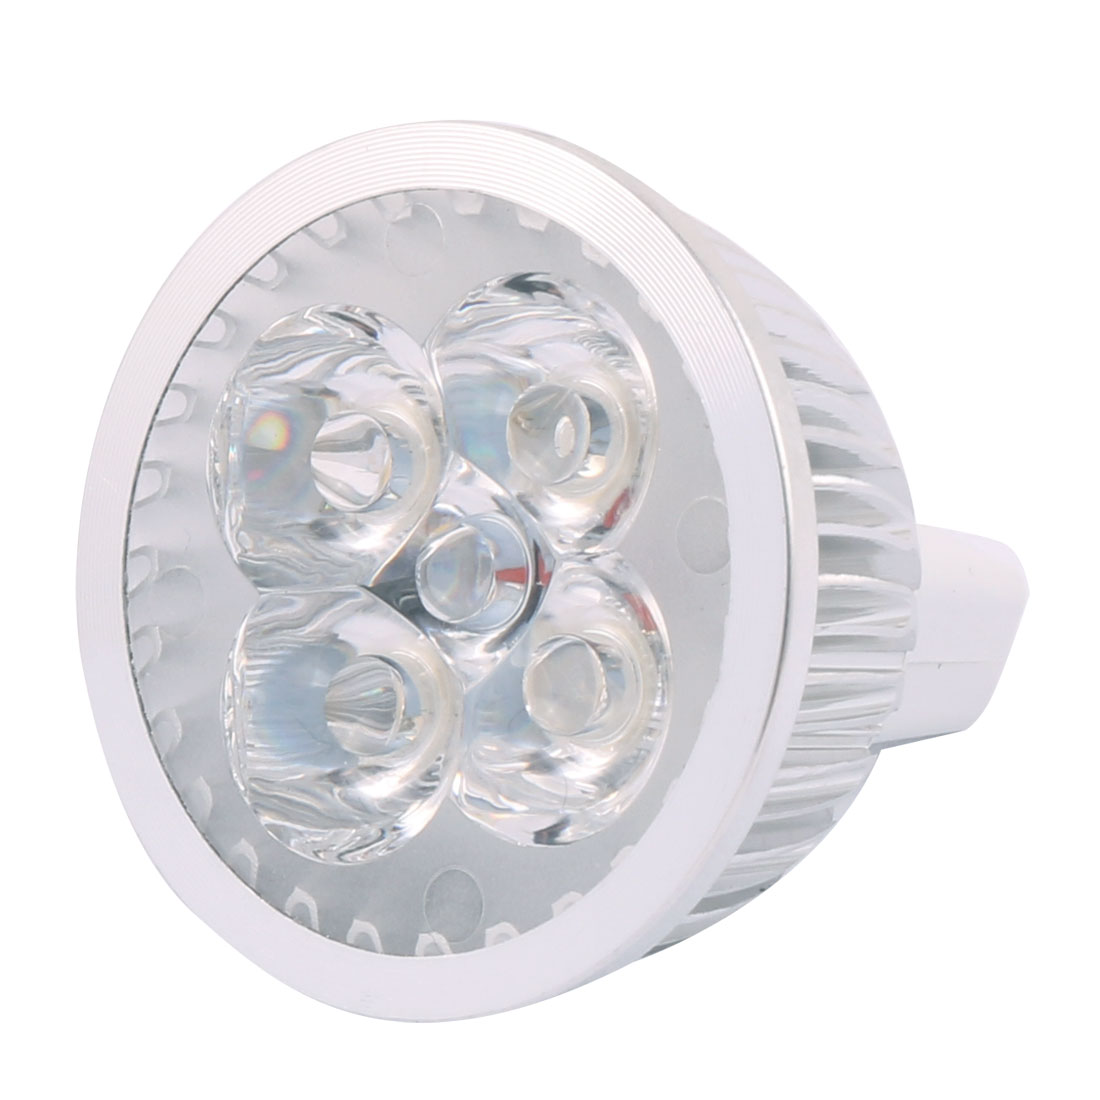 DC 12V 4W MR16 4 LEDs Ultra Bright COB Spotlight Bulb Energy Saving Downlight Cool White